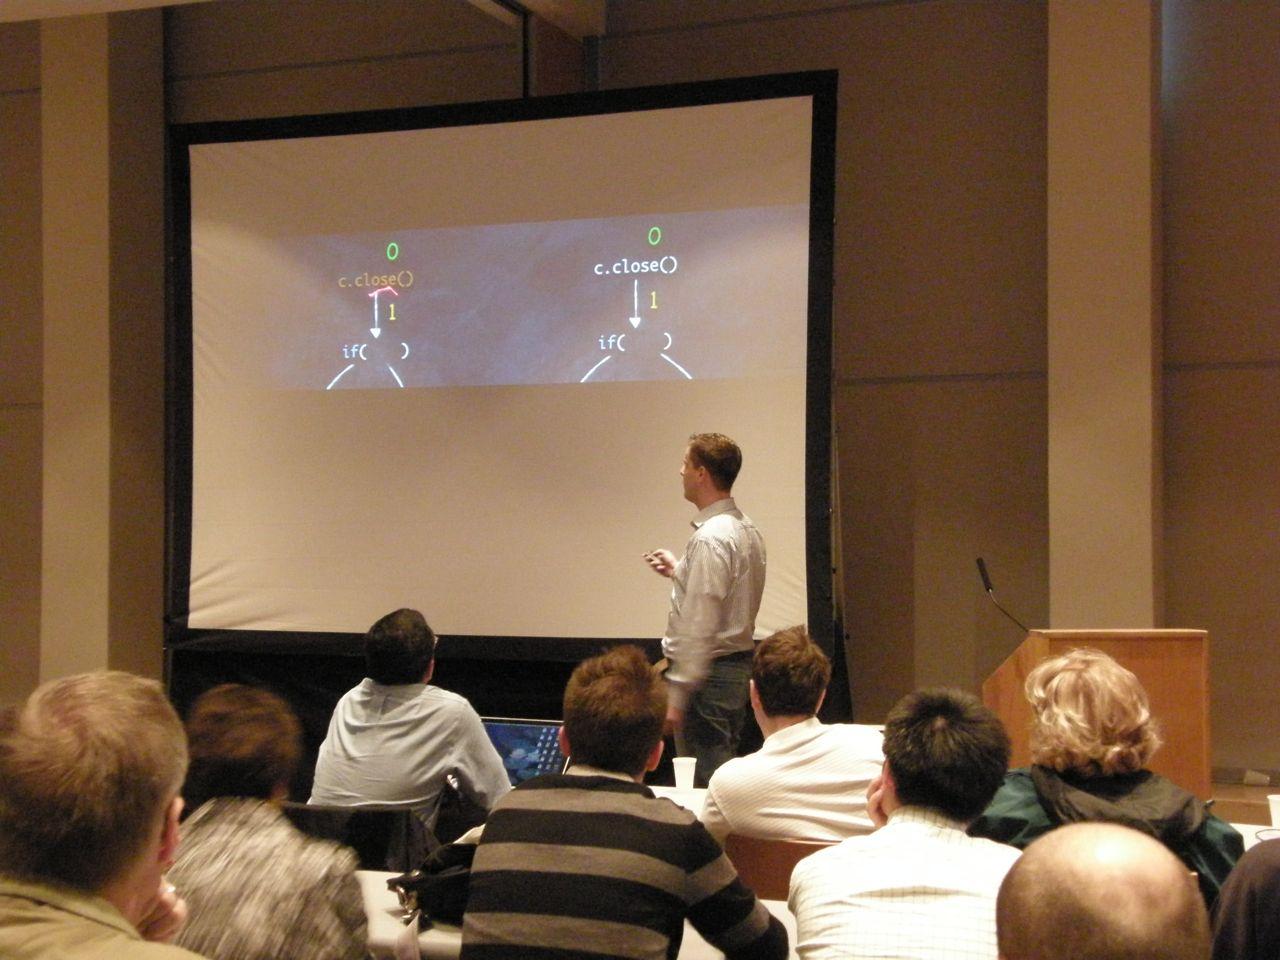 ICSE 2010 Presentation